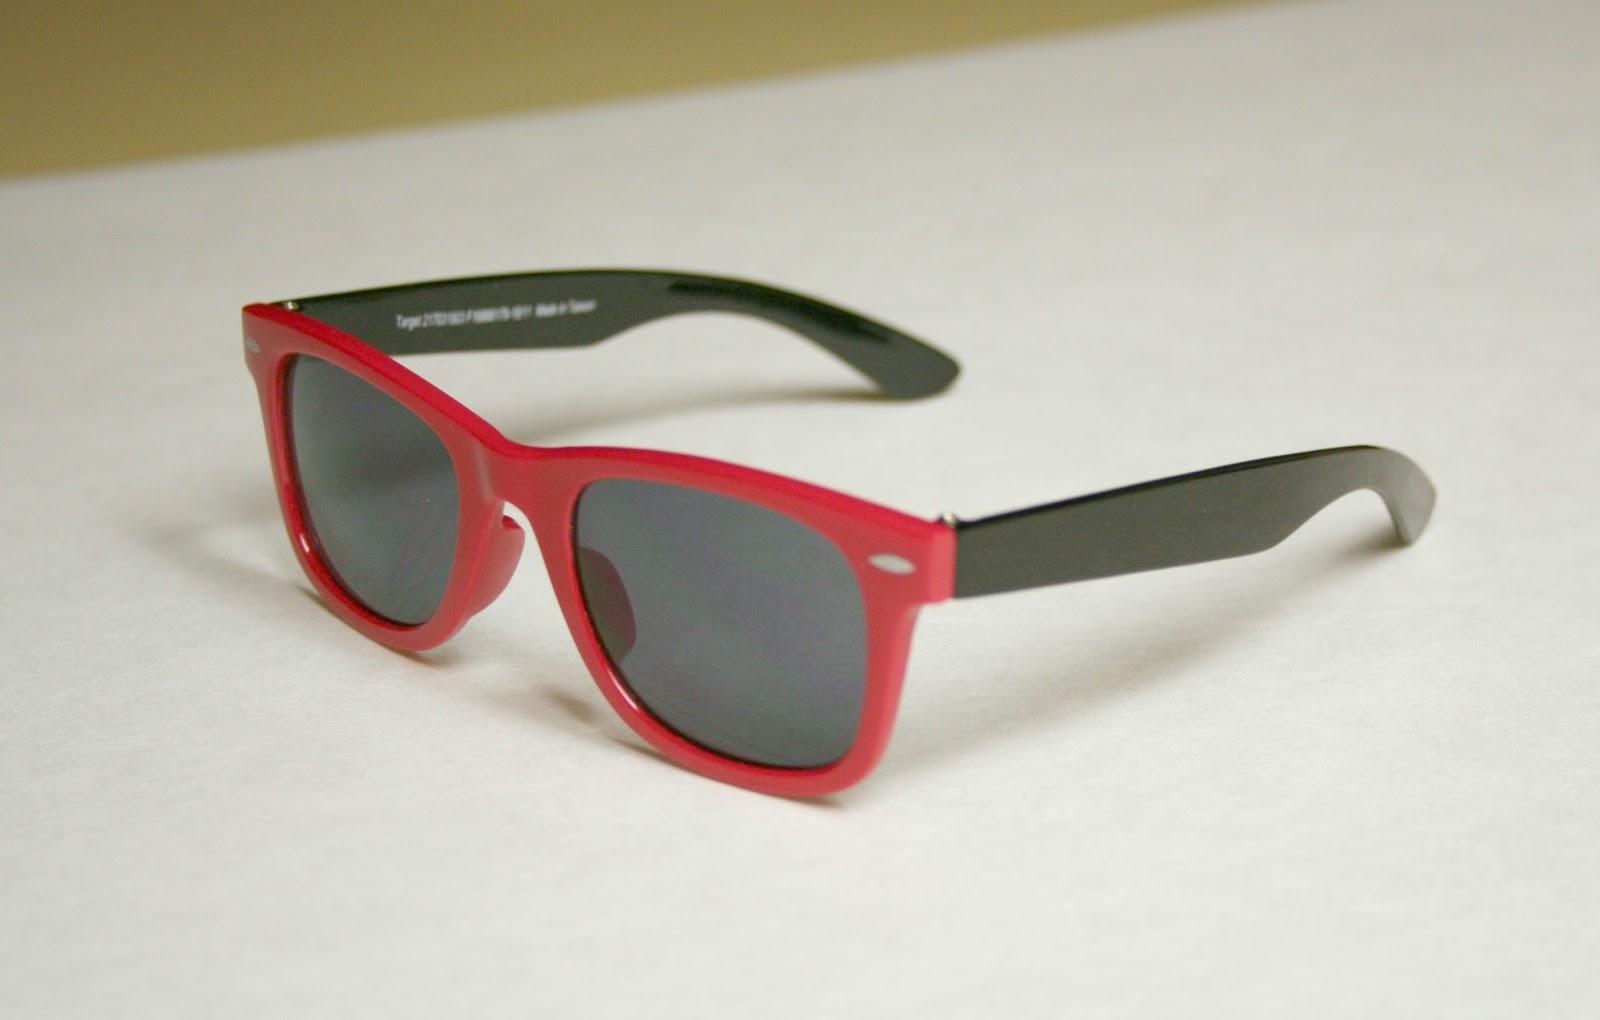 a35ed39e72 ray ban prescription glasses walmart ray ban eyeglasses for women cheap